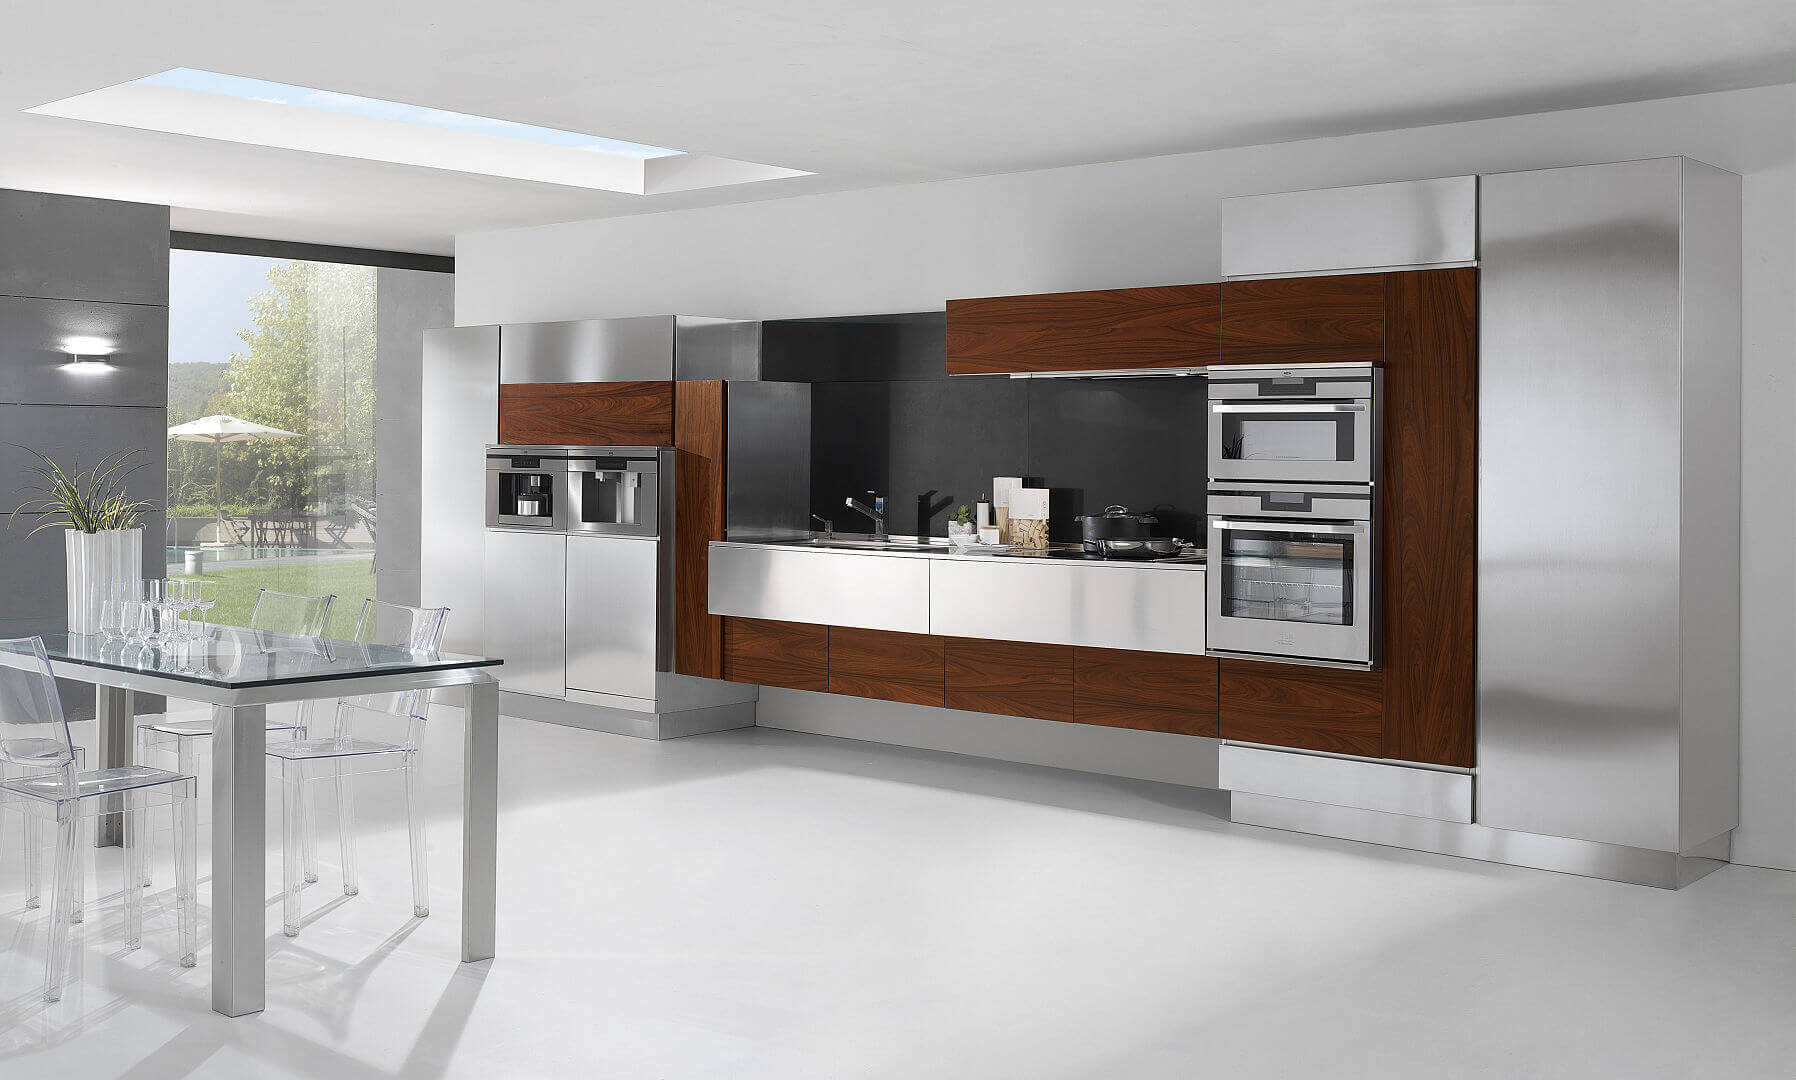 Cucine Italiane Moderne. Good Via With Cucine Italiane Moderne ...